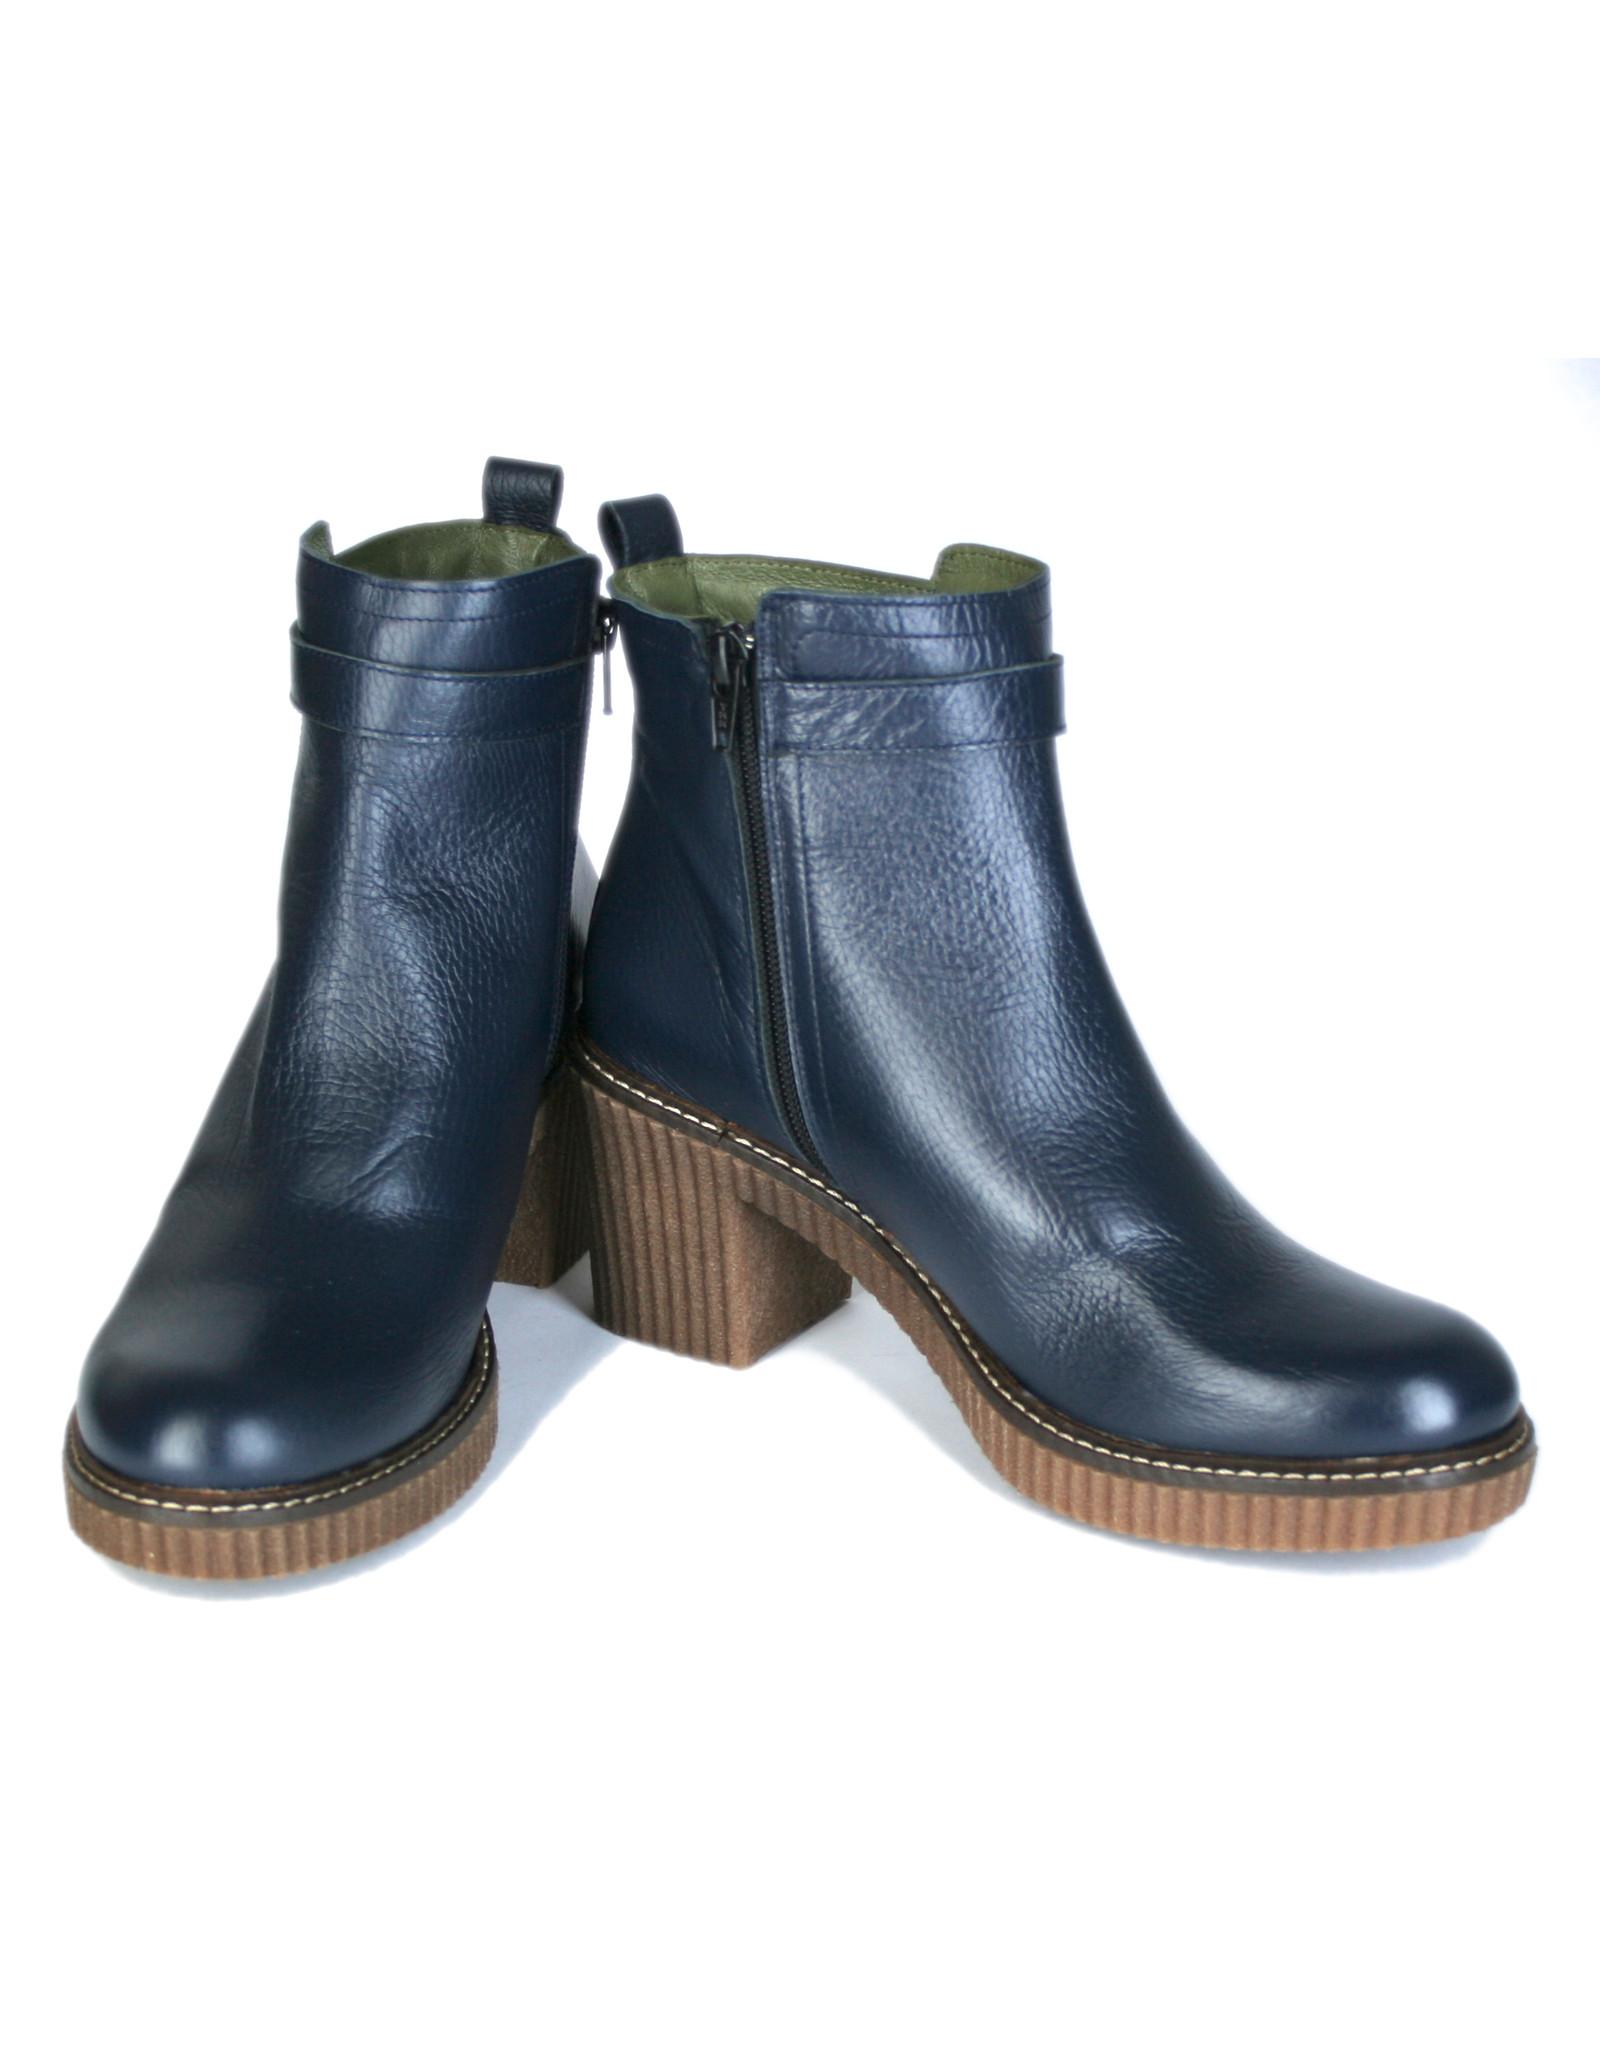 Jonny's Boots with heels, blue